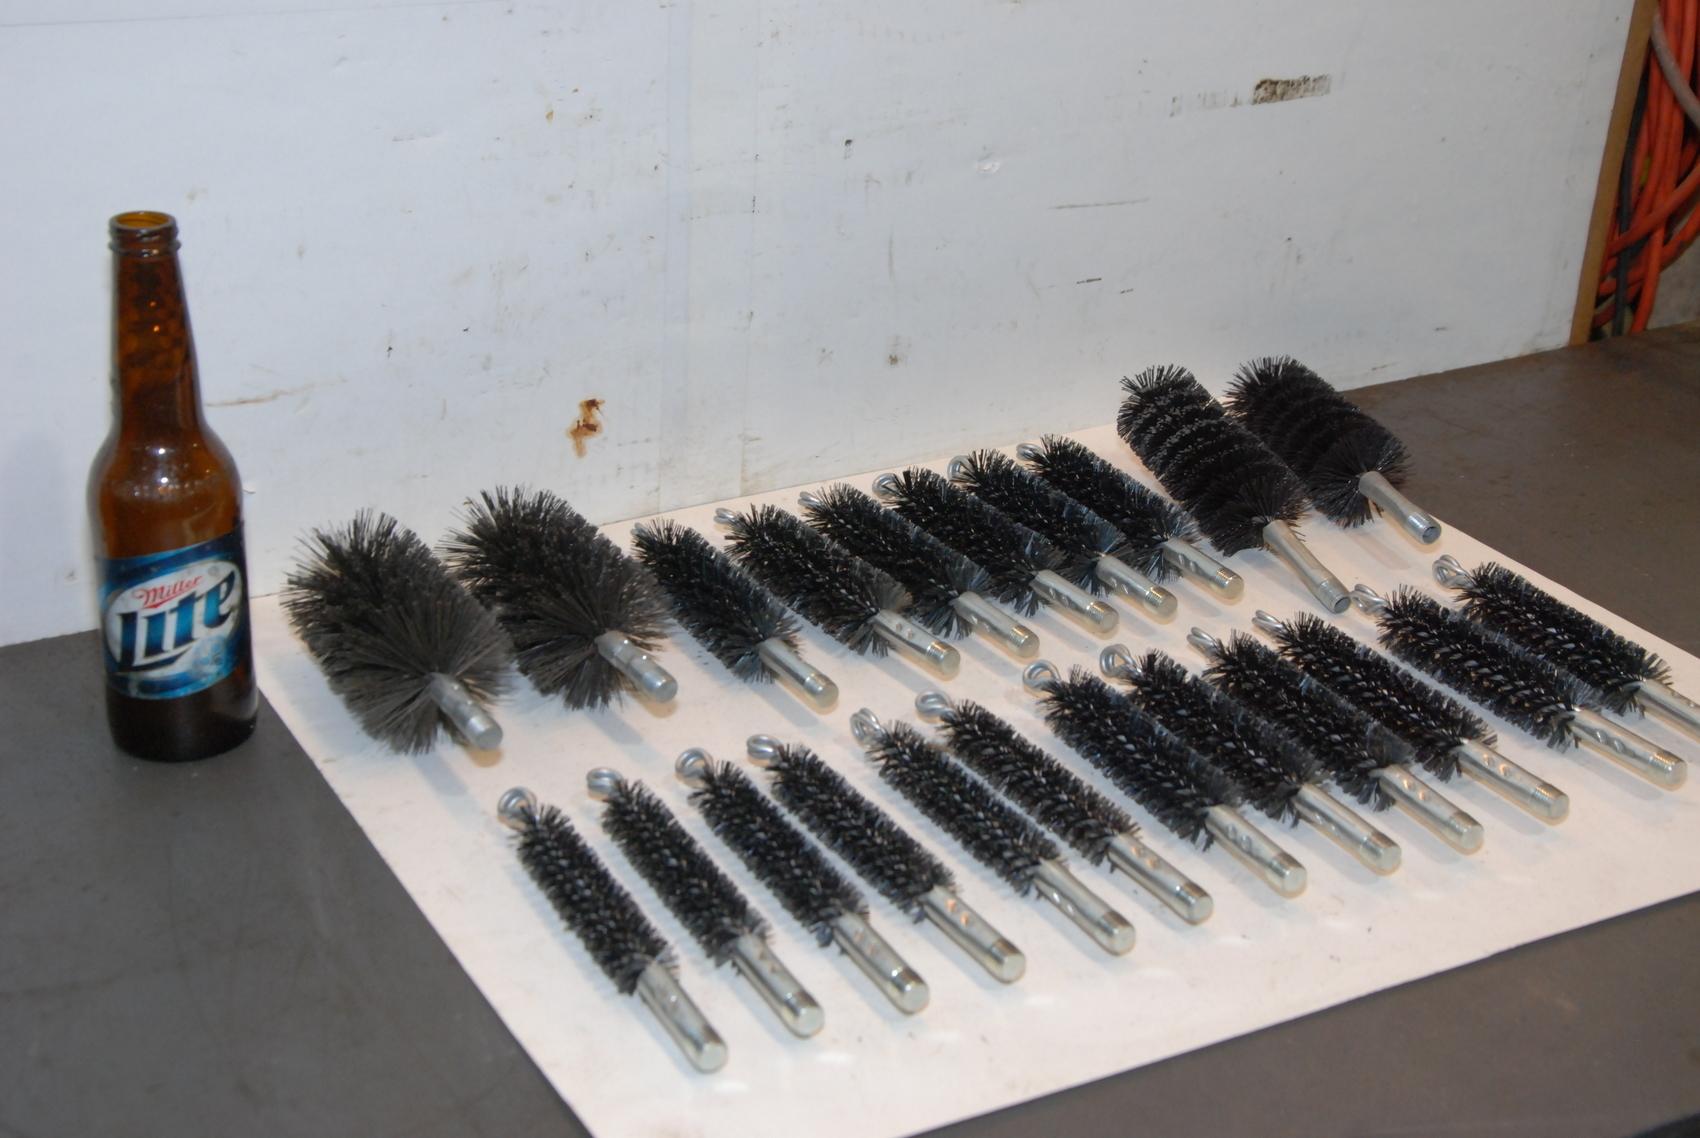 Lot of 22 Weiler Flue Brush 4,5in 012 Steel Wire